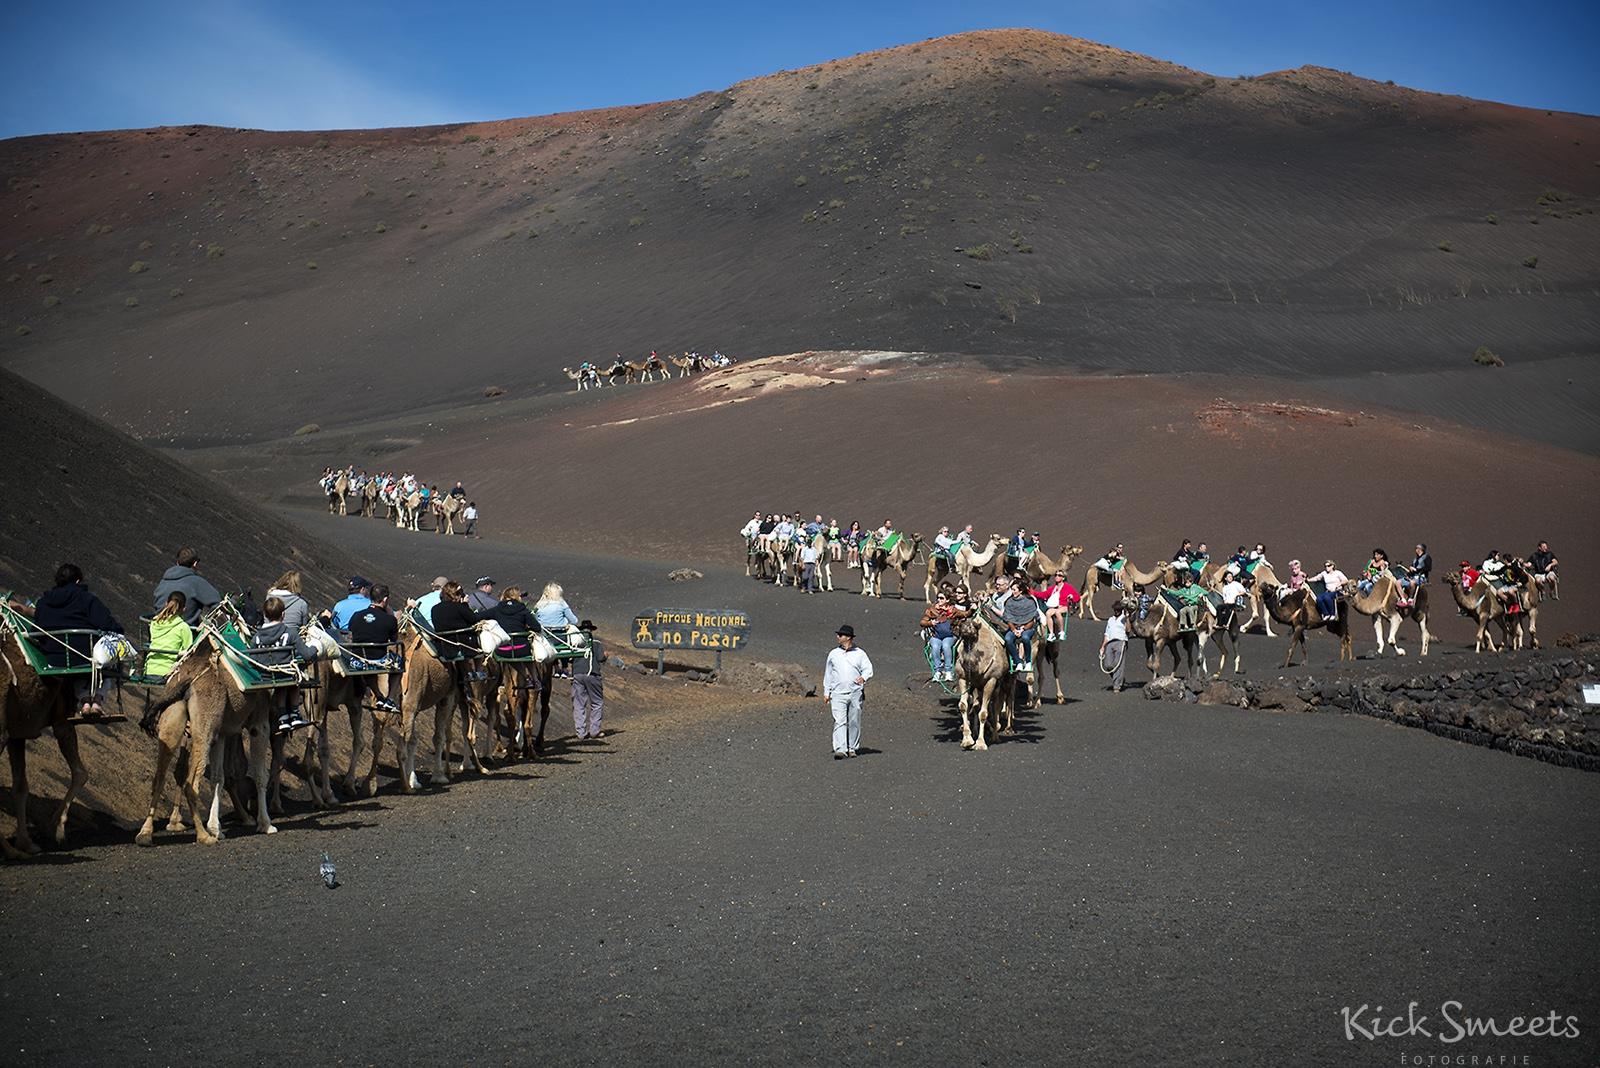 Toerisme op Lanzarote